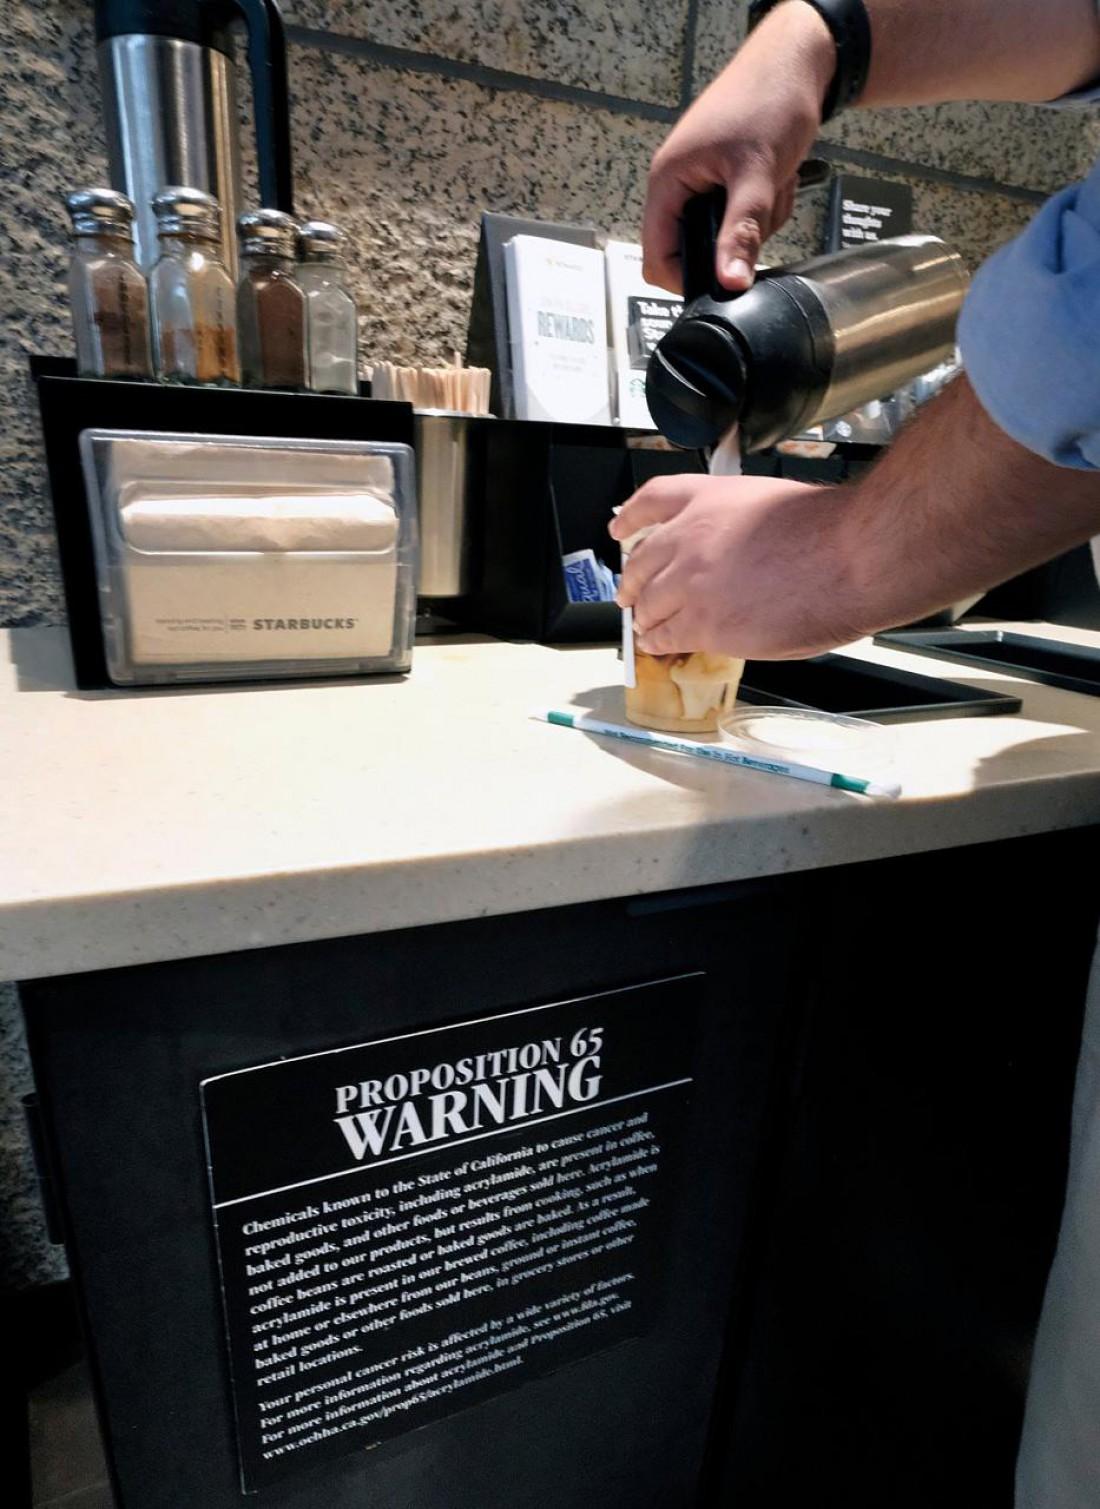 Starbucks. Предупреждающий знак о вреде кофе. Лос-Анджелес, Калифорния